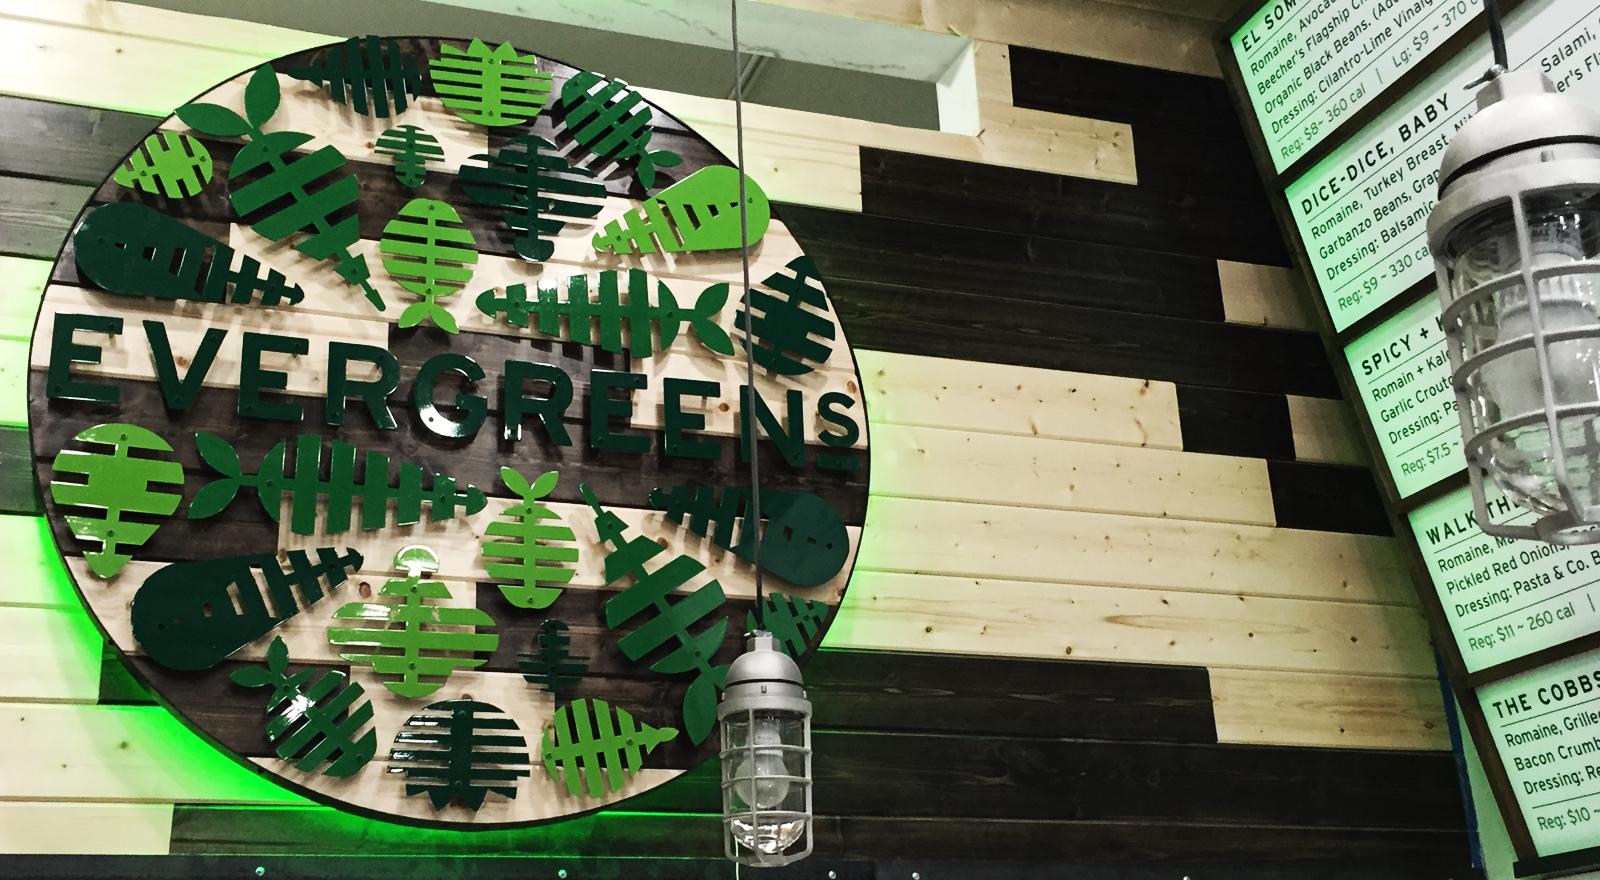 evergreens_signage.jpg